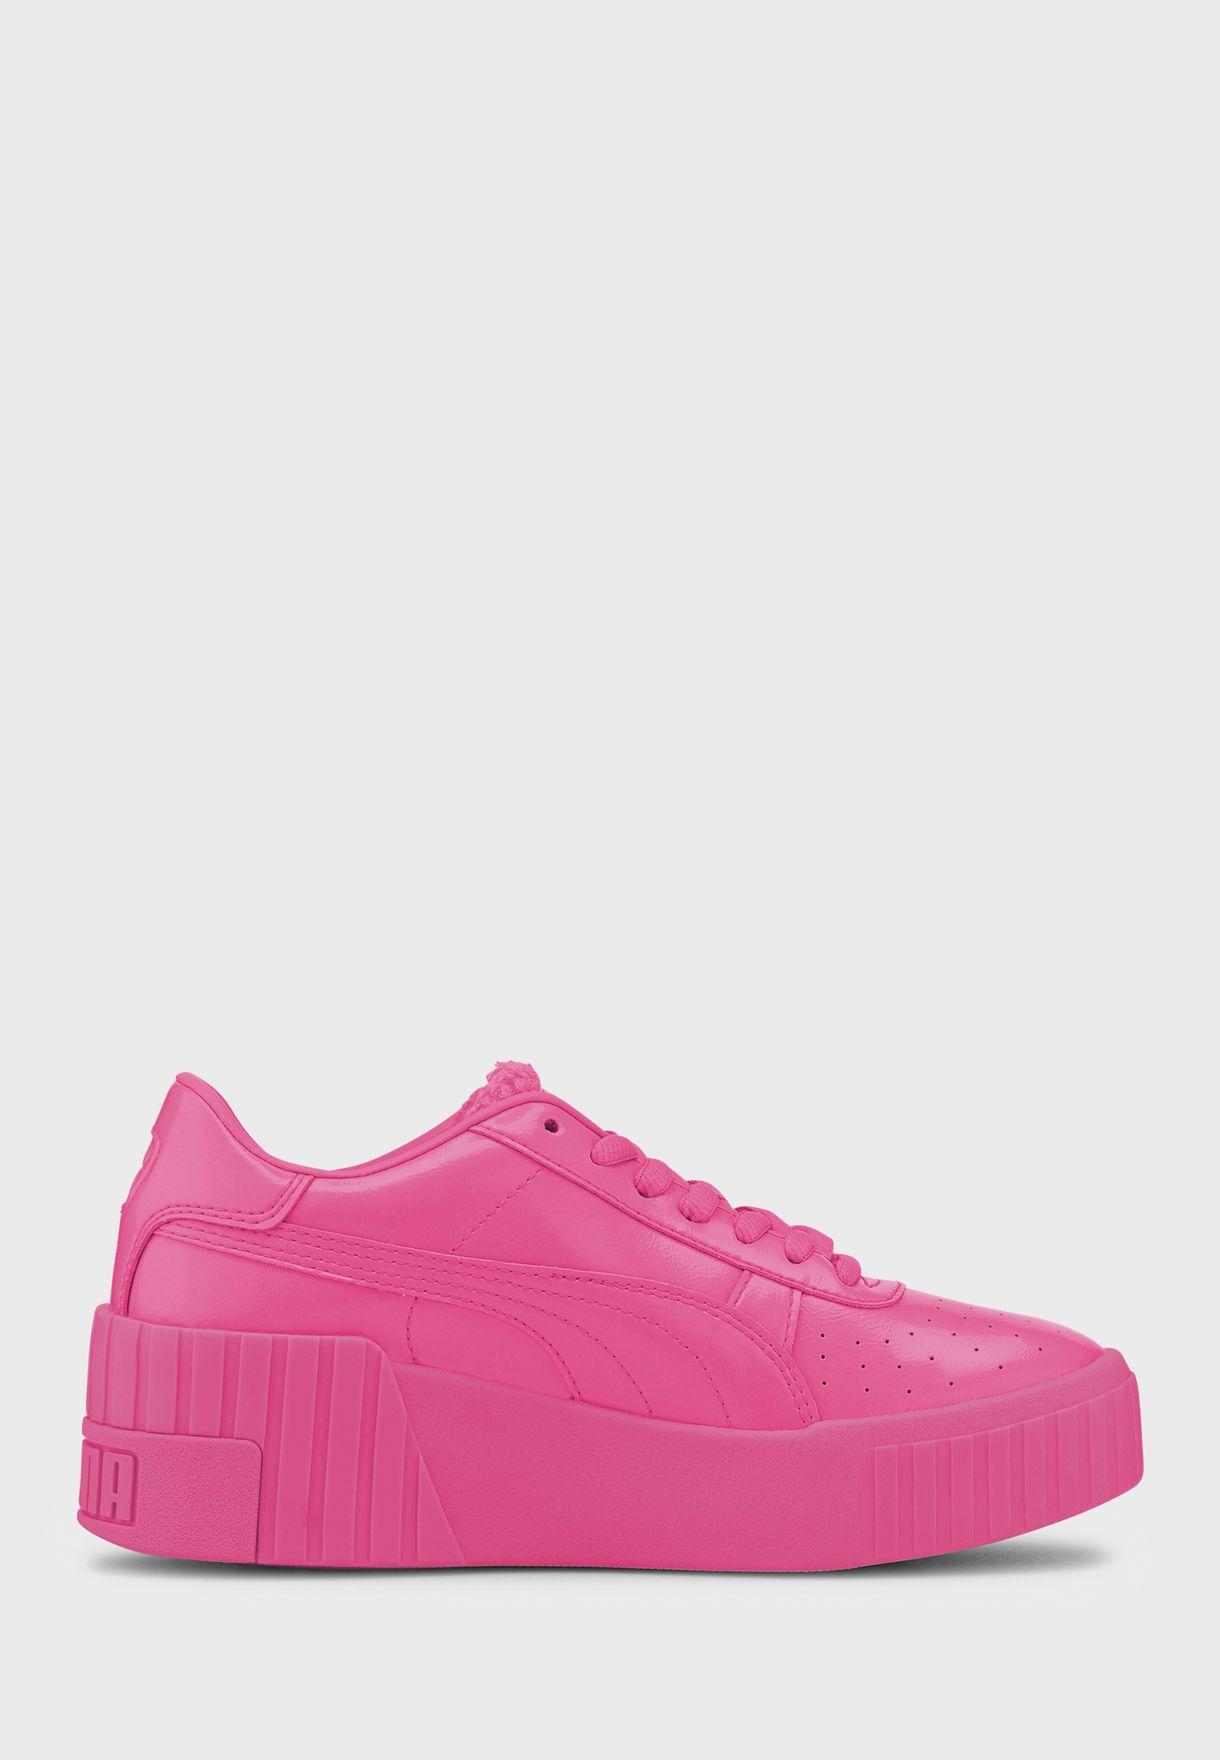 Cali women sneakers